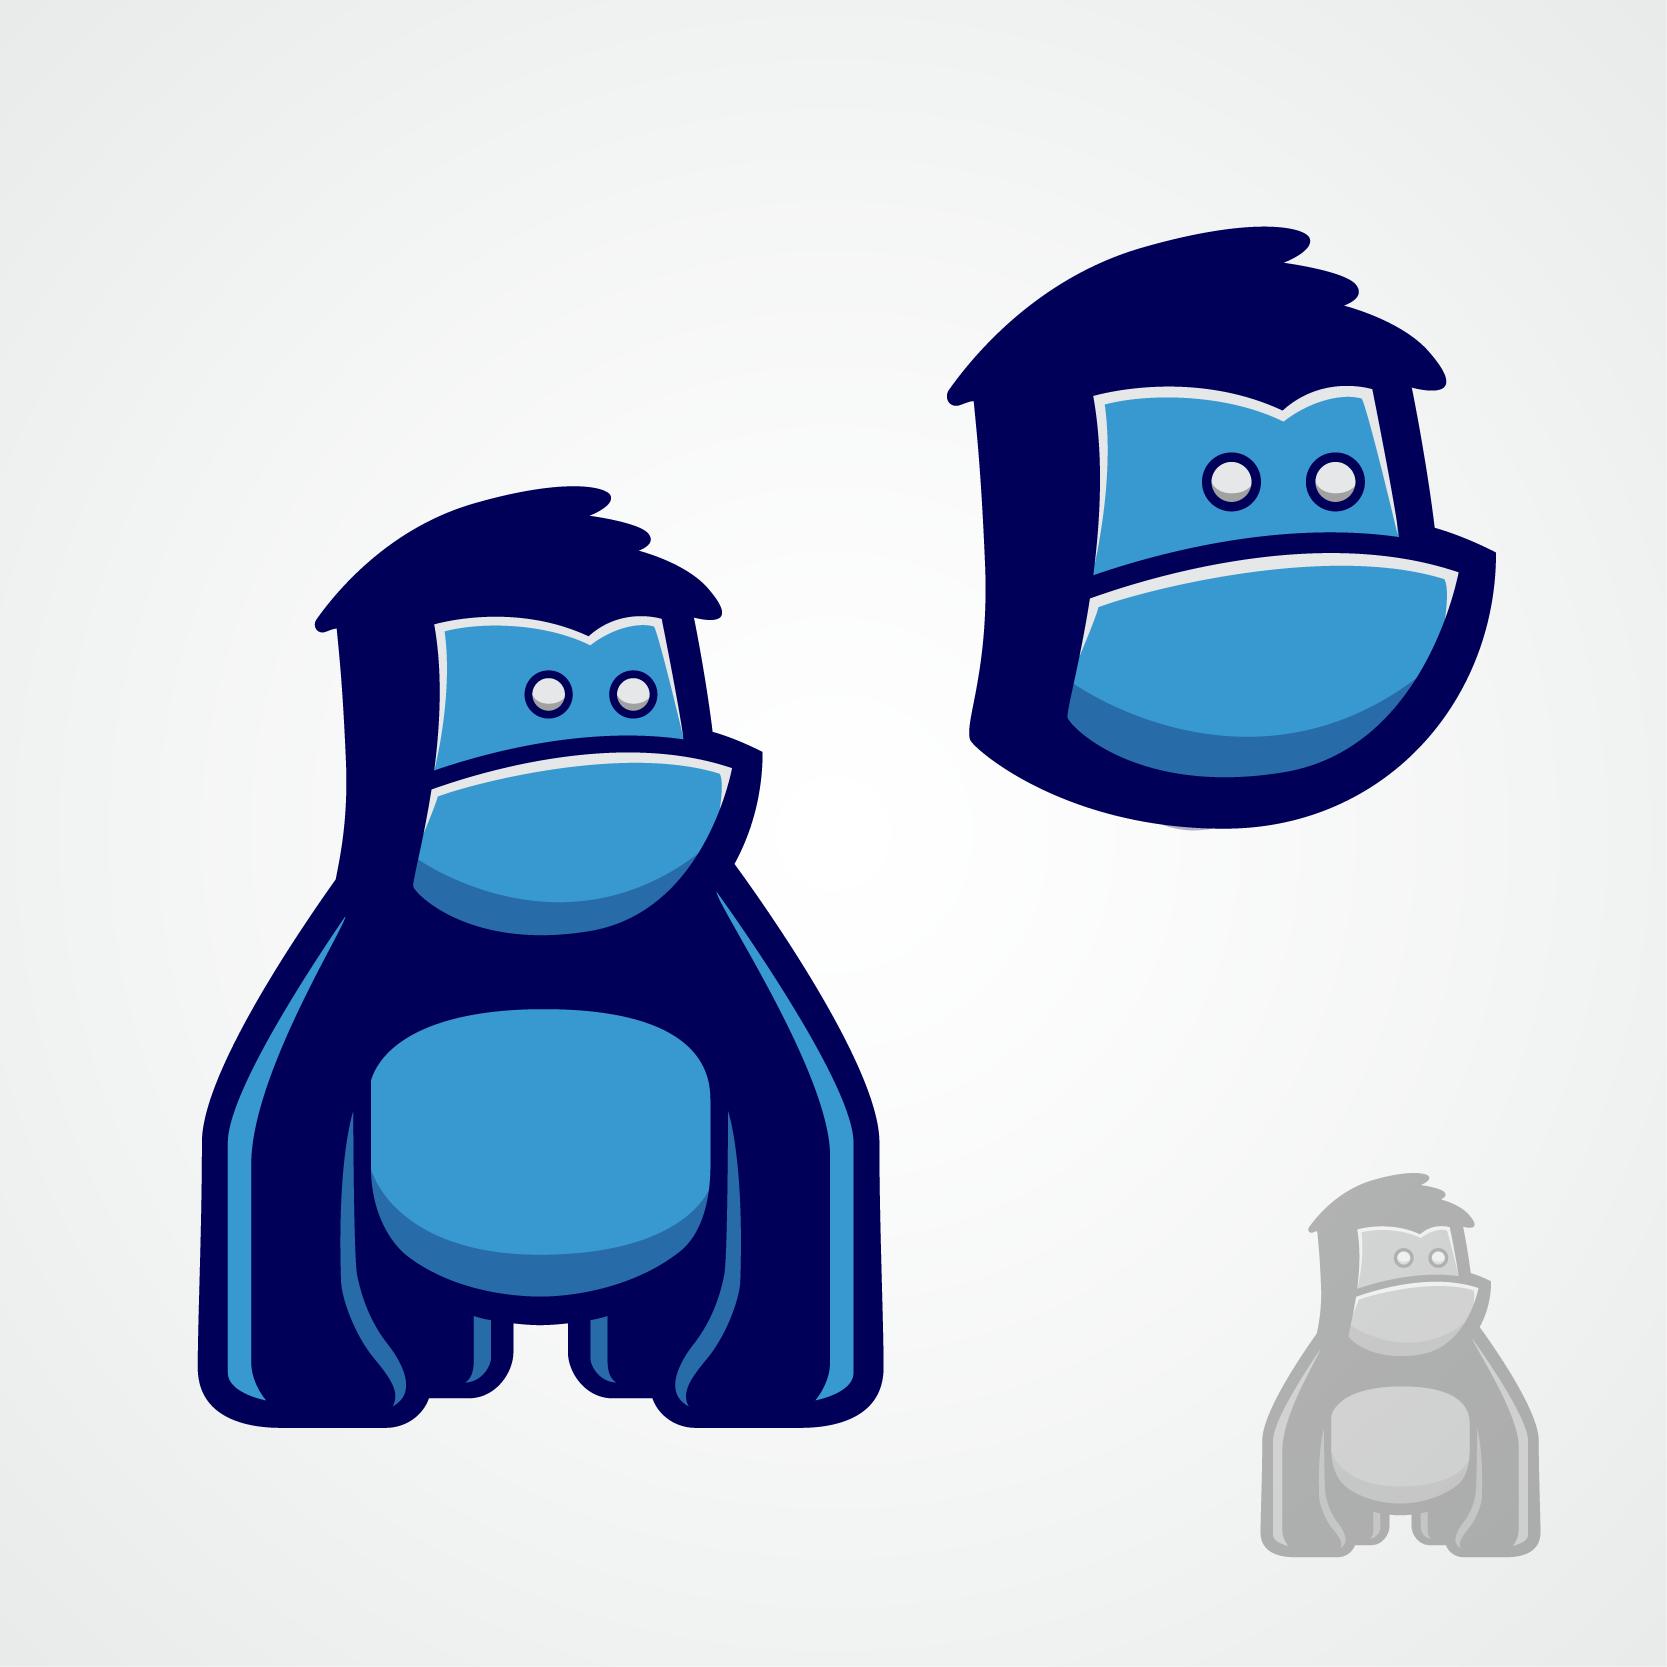 Gorilla face logo contest, just for Flat Design expert.